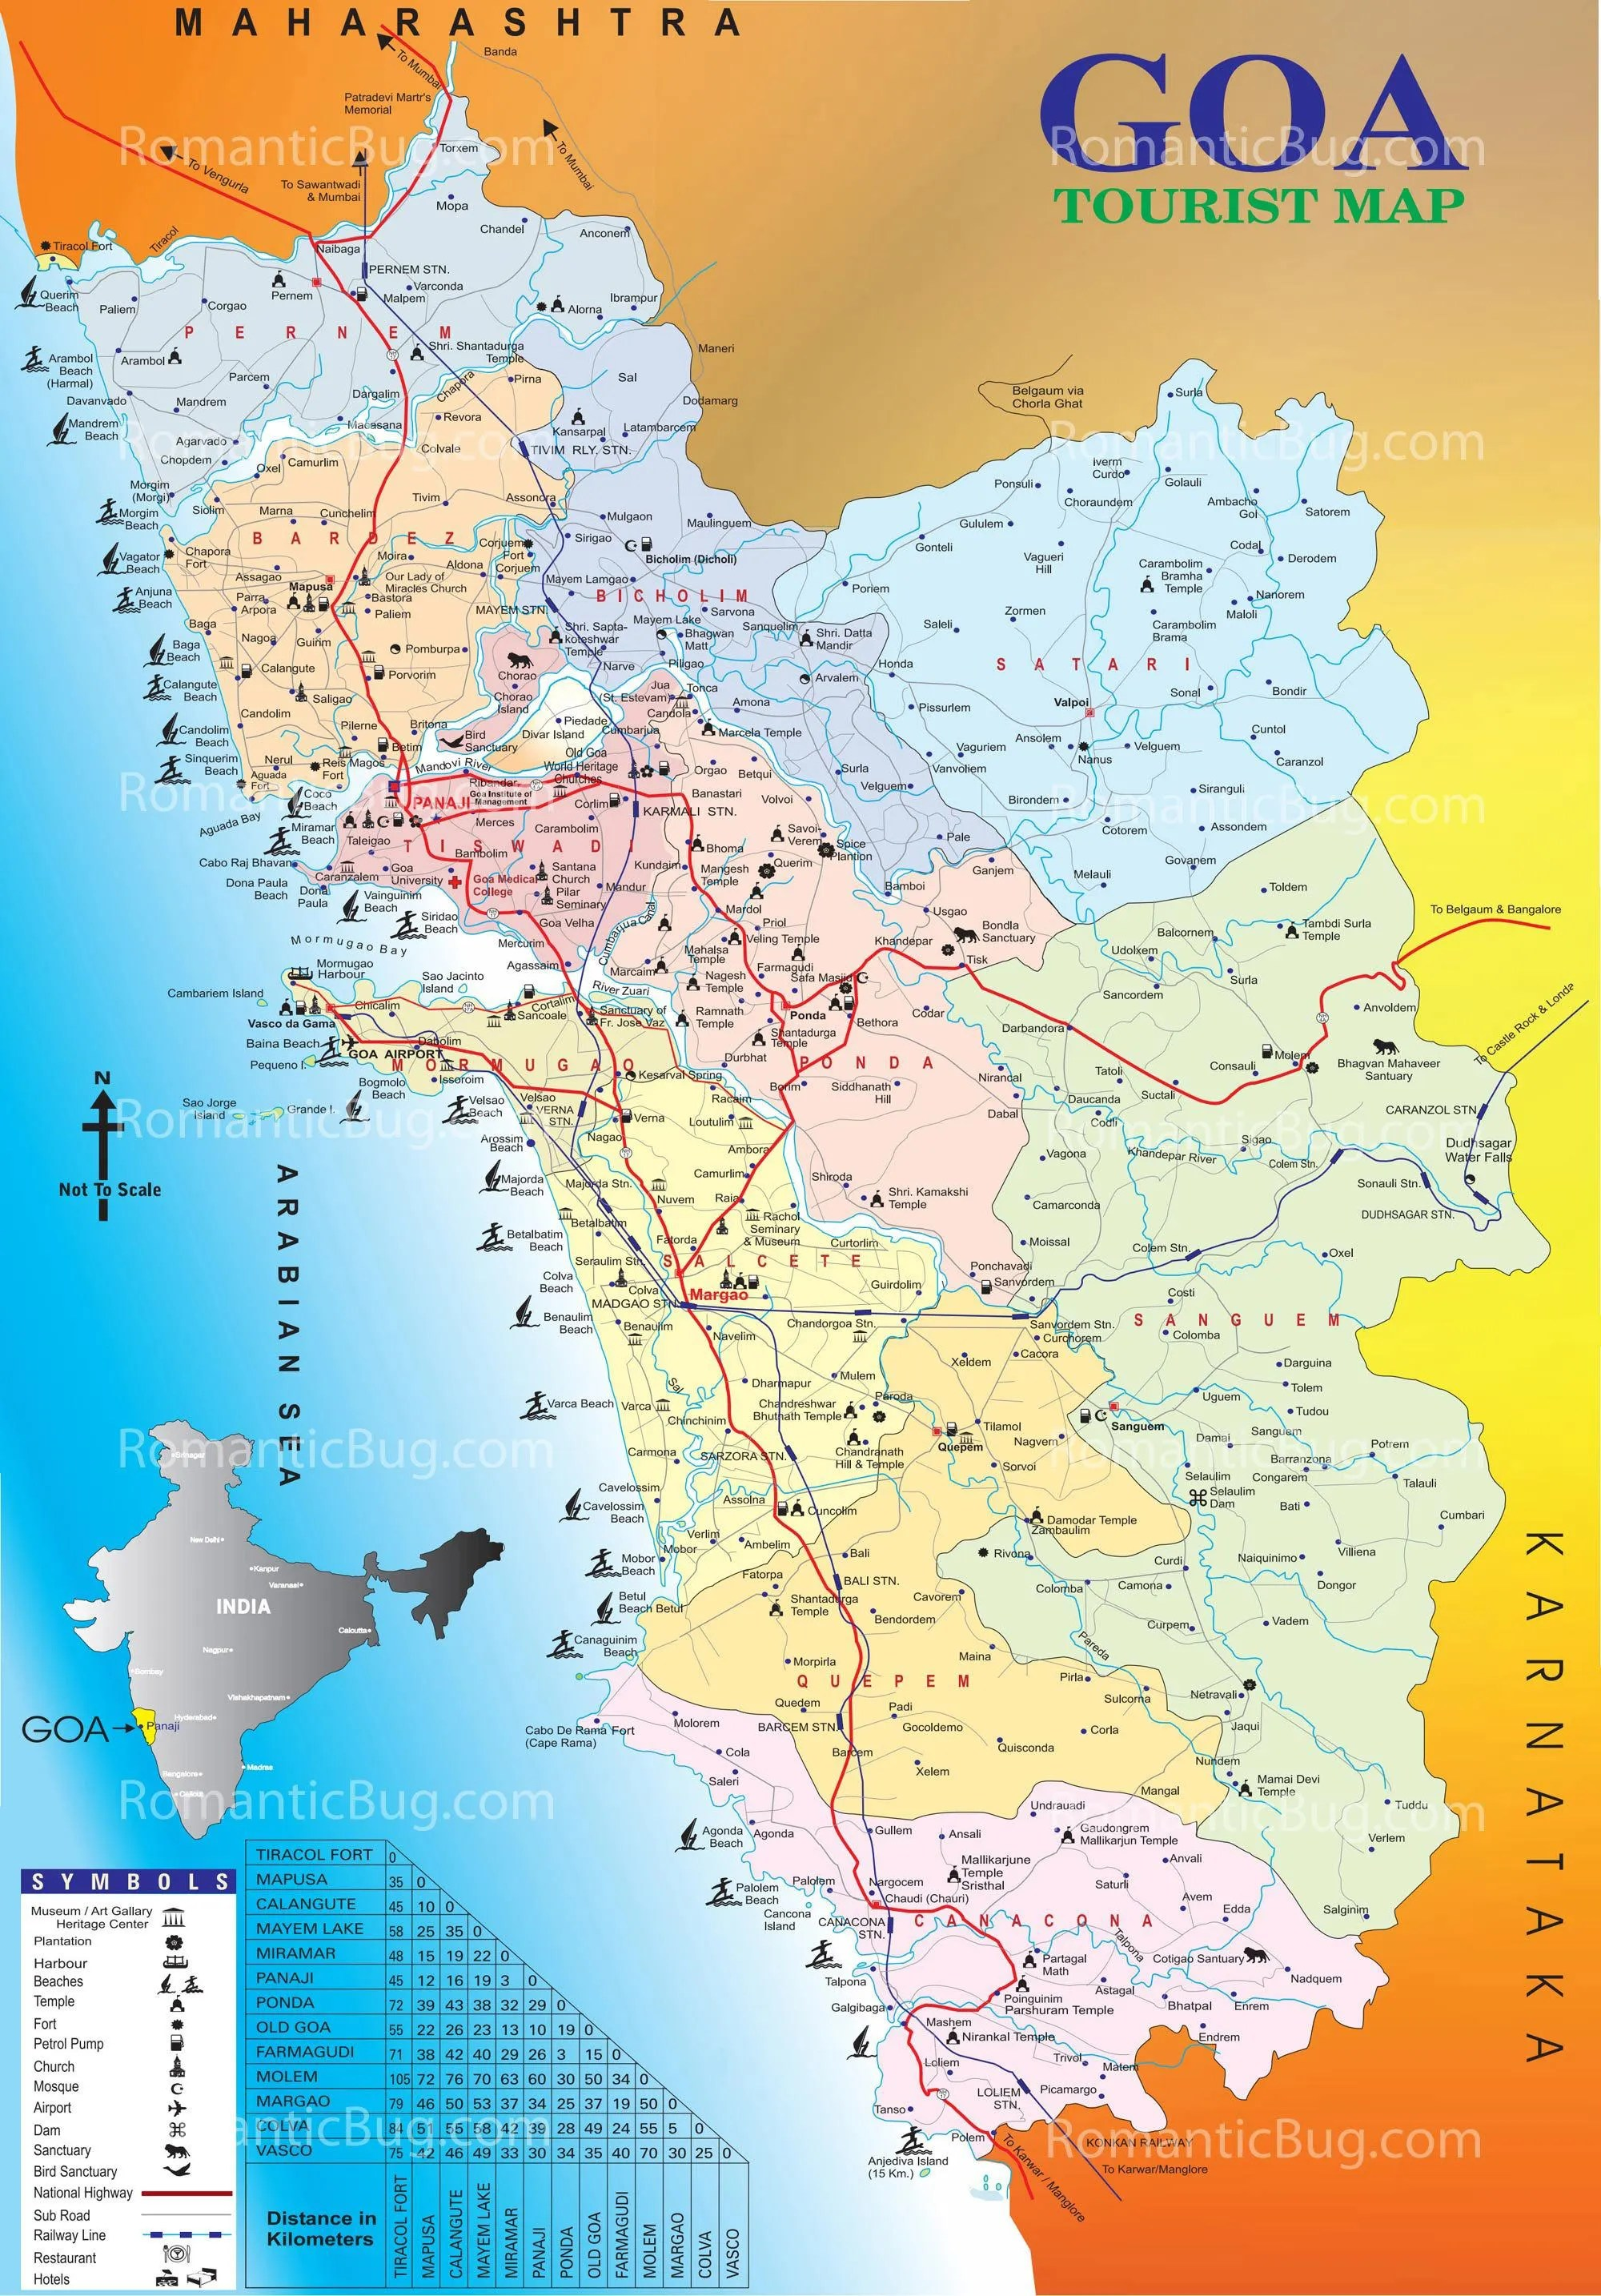 Complete Tourist Map of Goa